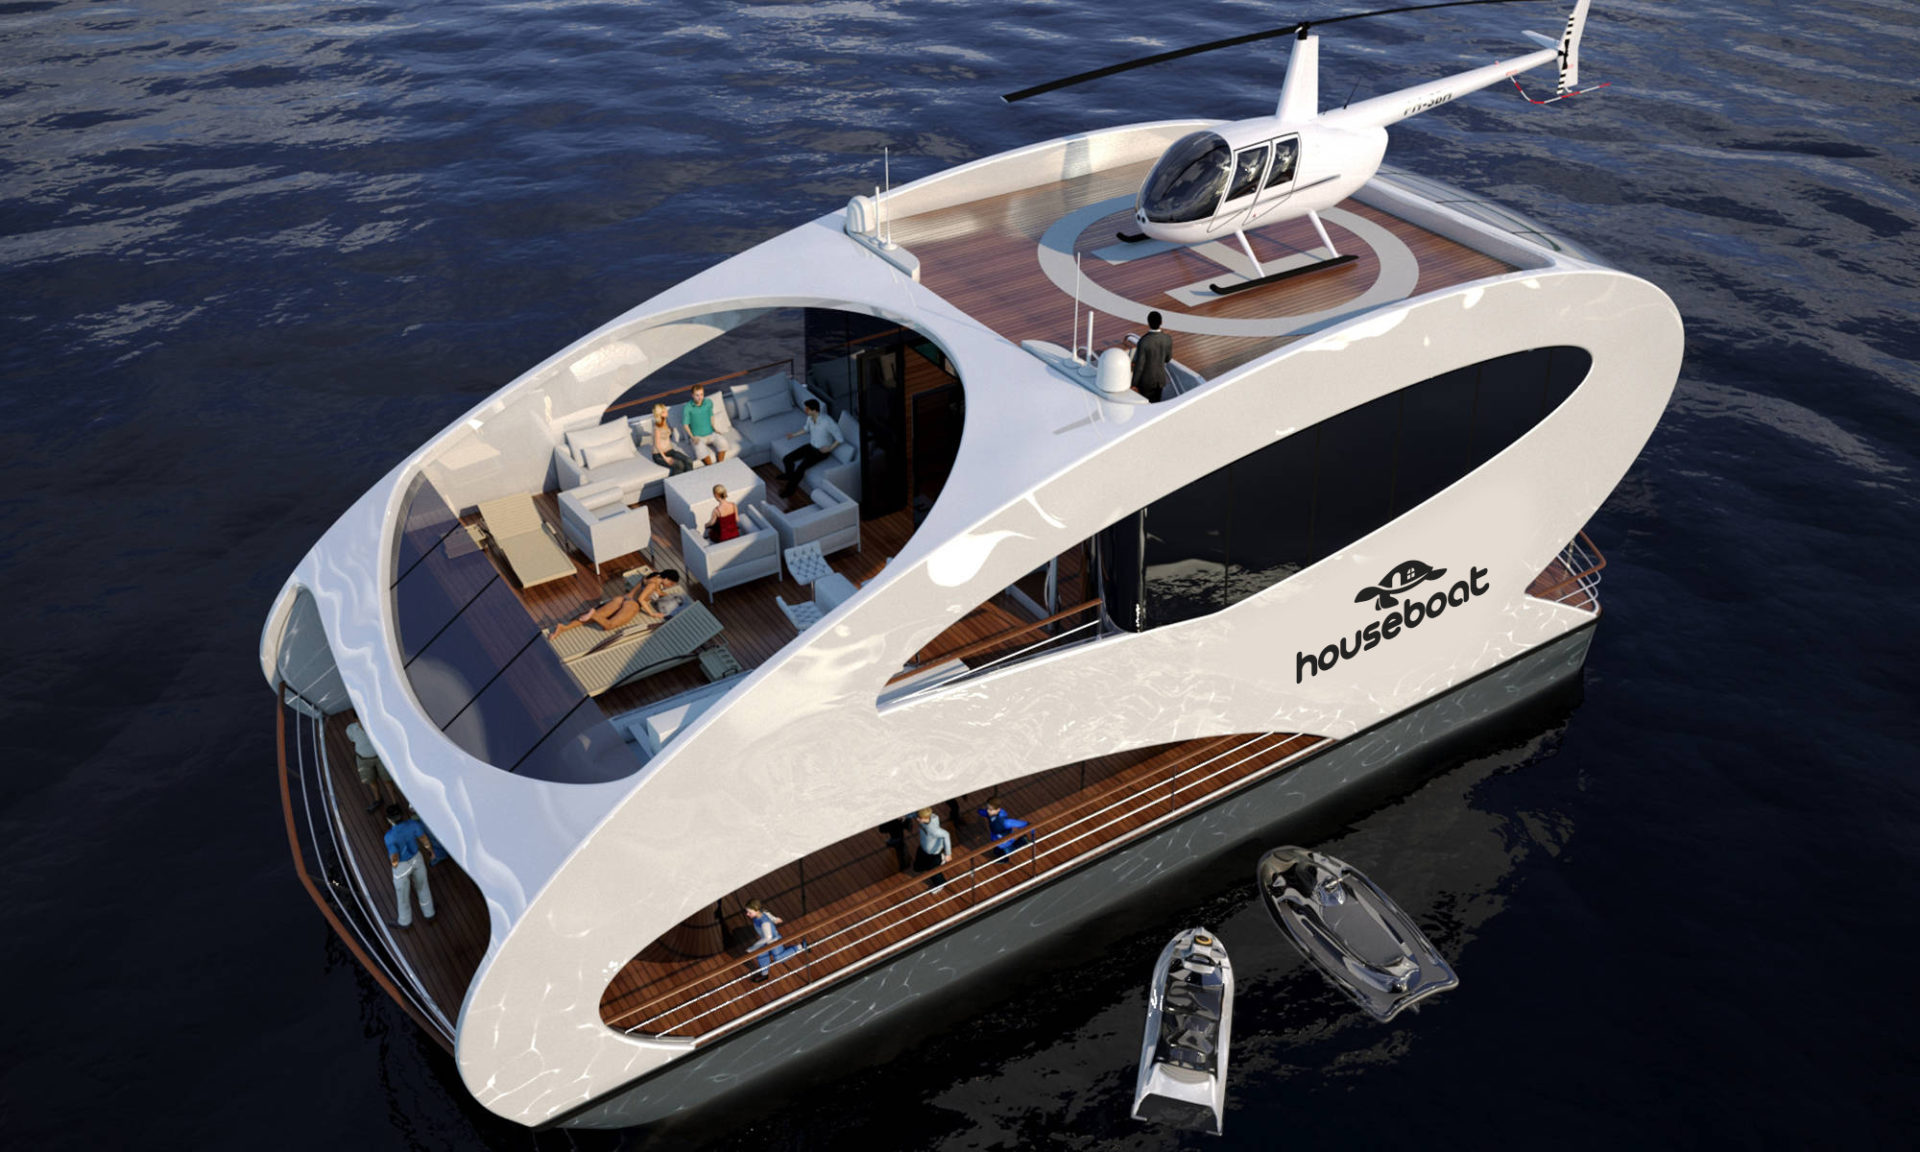 http://houseboat.ru/wp-content/uploads/2017/06/8-2.jpg